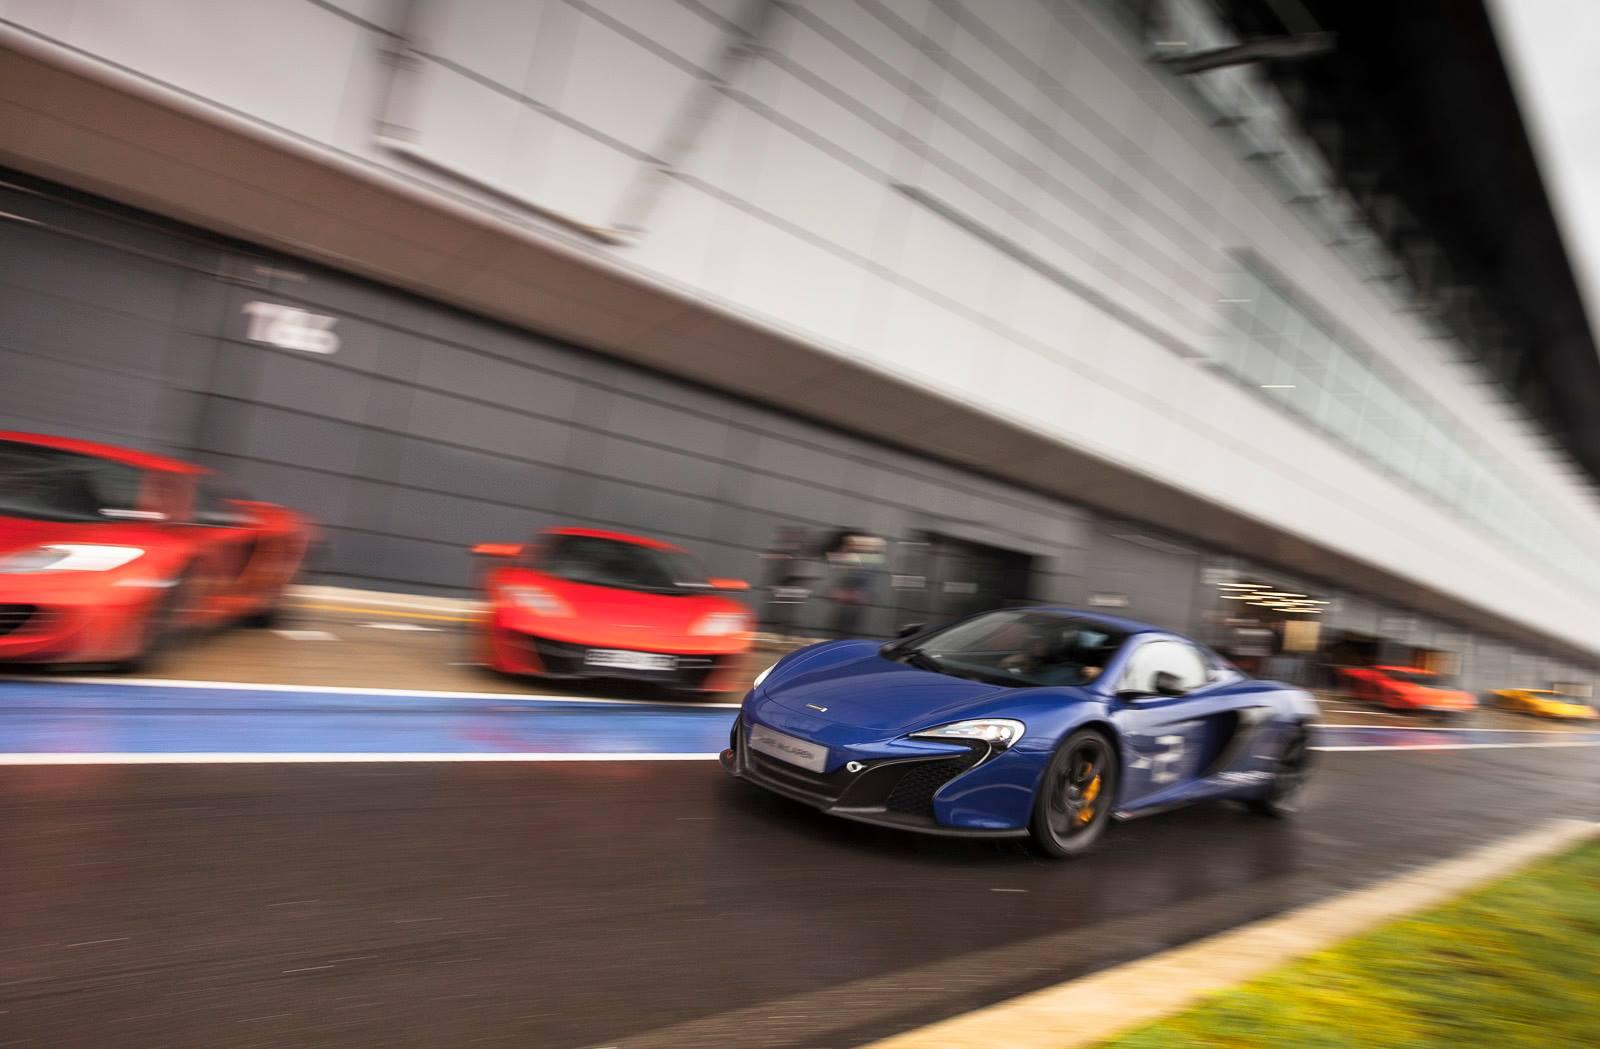 Pure Mclaren Driving Experience At Silverstone Circuit Gtspirit